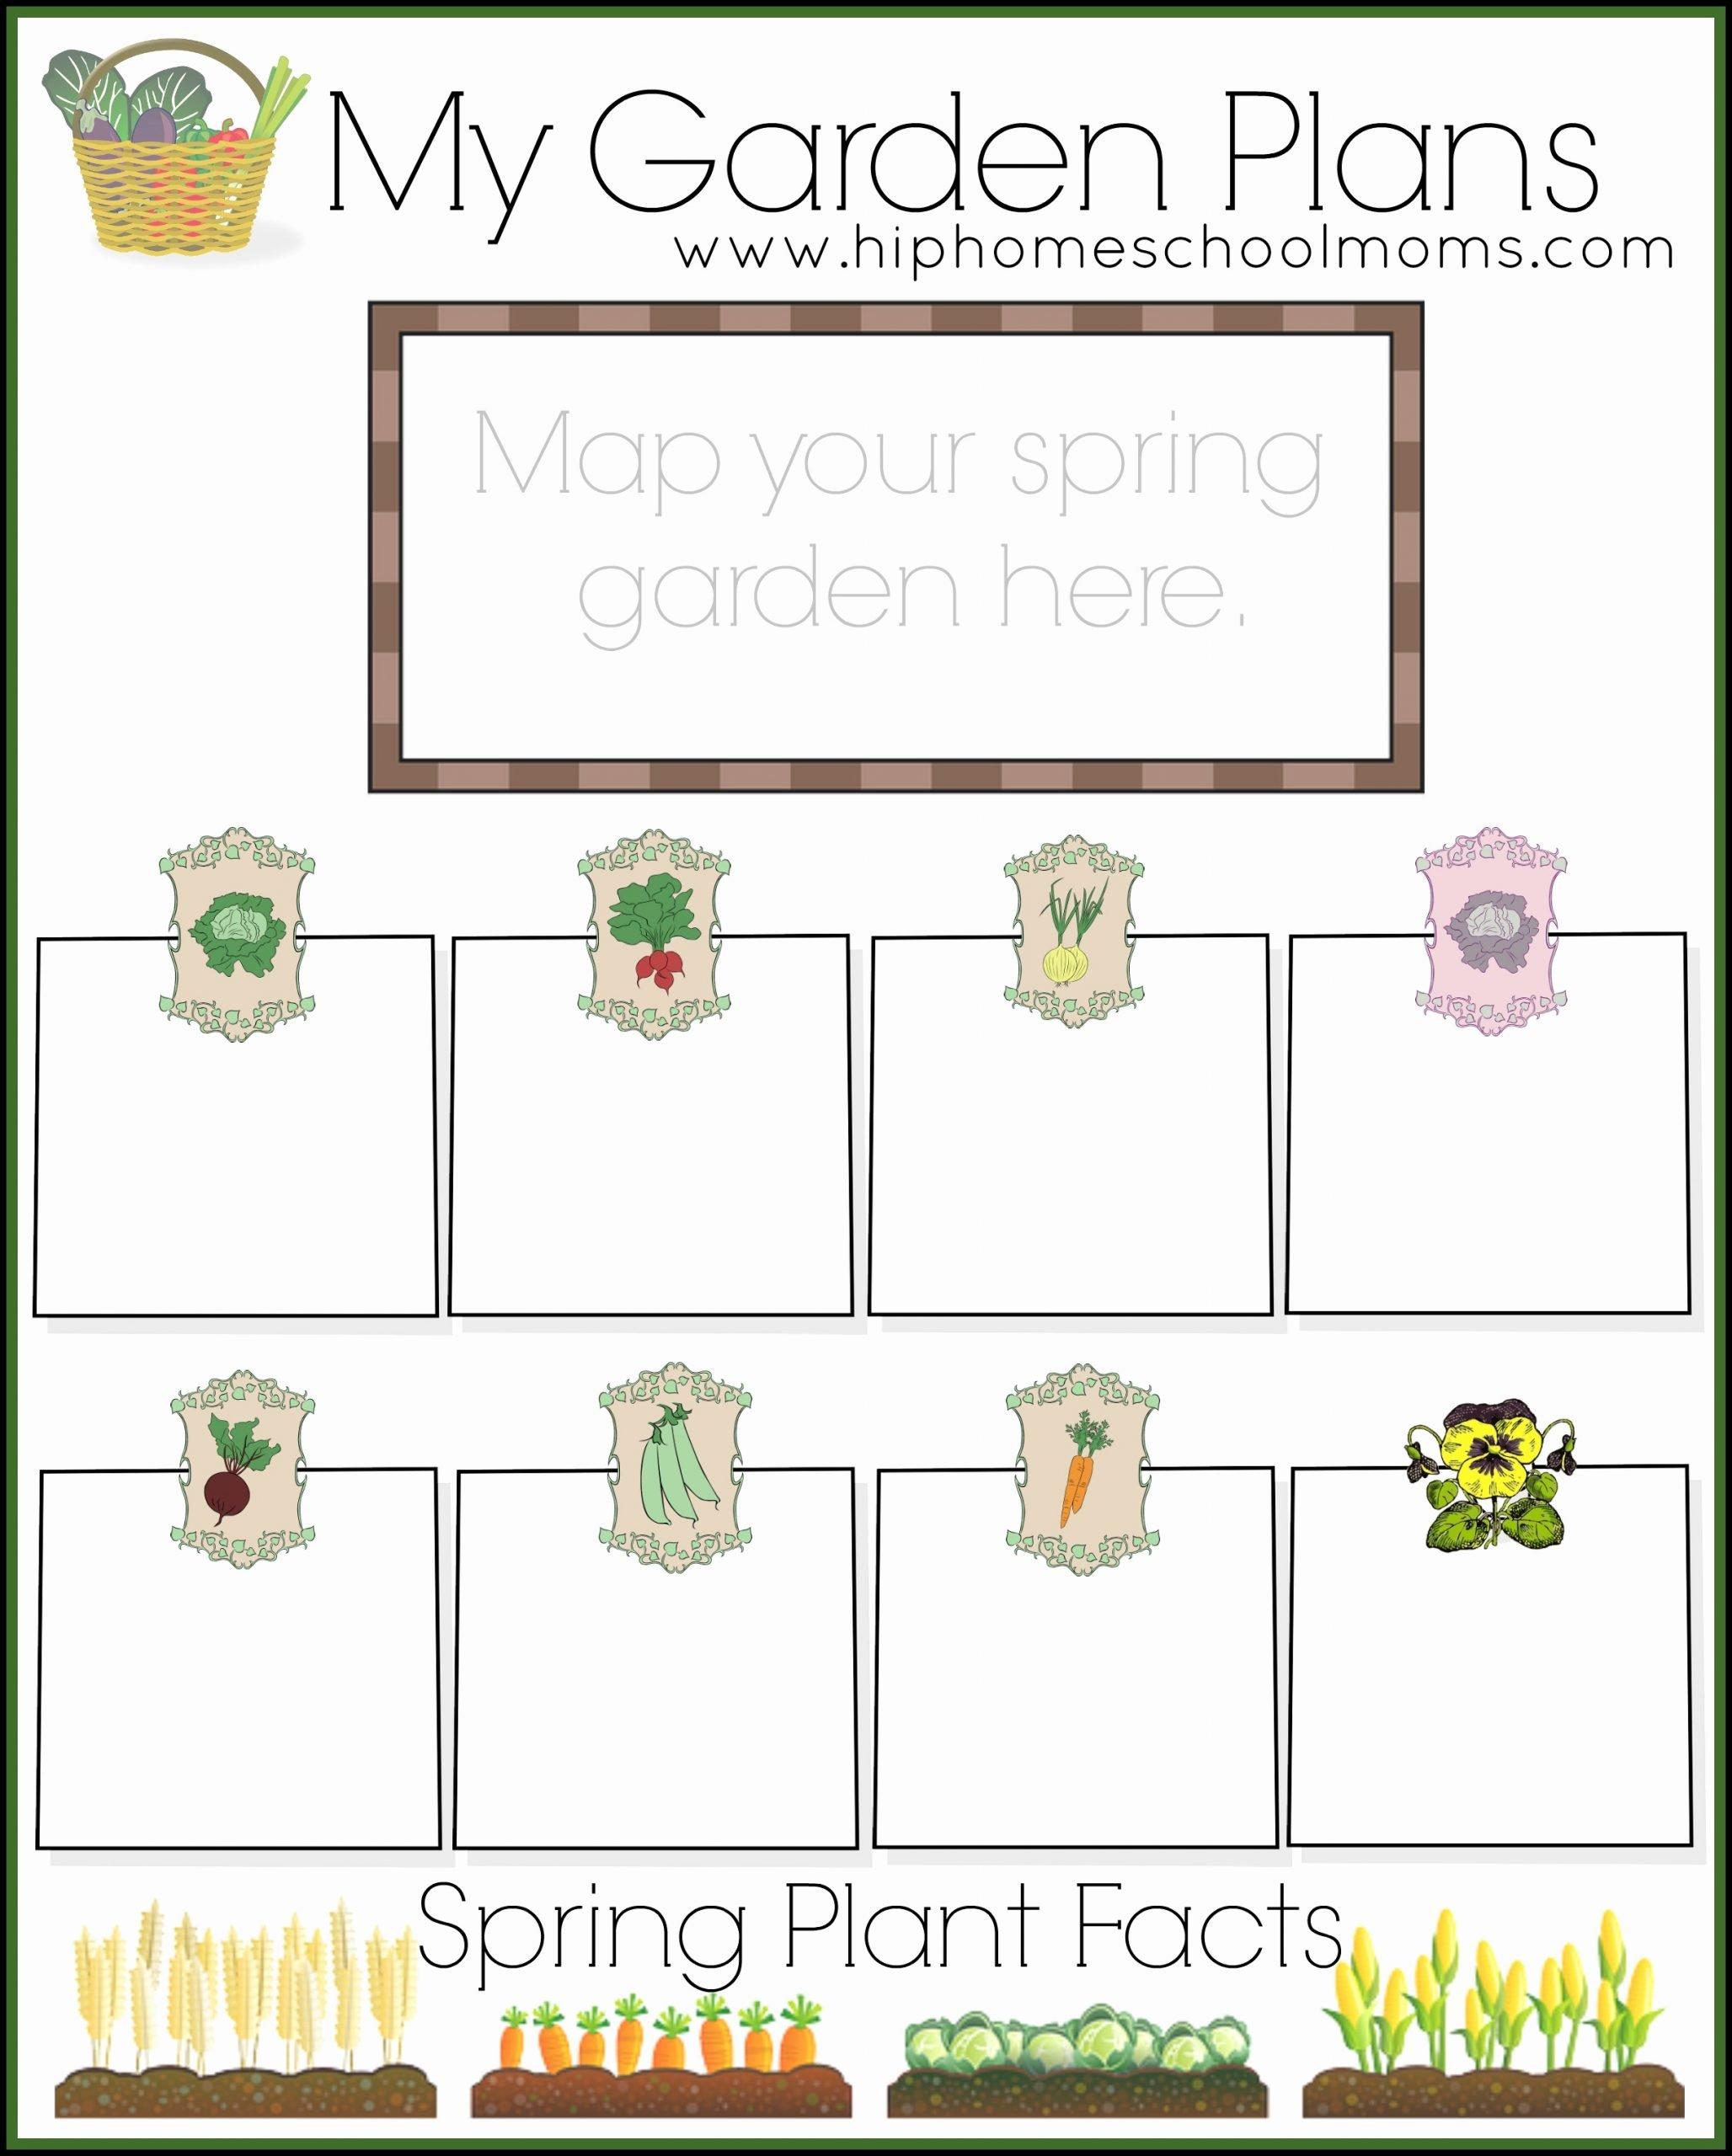 Gardening Worksheets for Preschoolers Kids Free Garden Planner for Kids